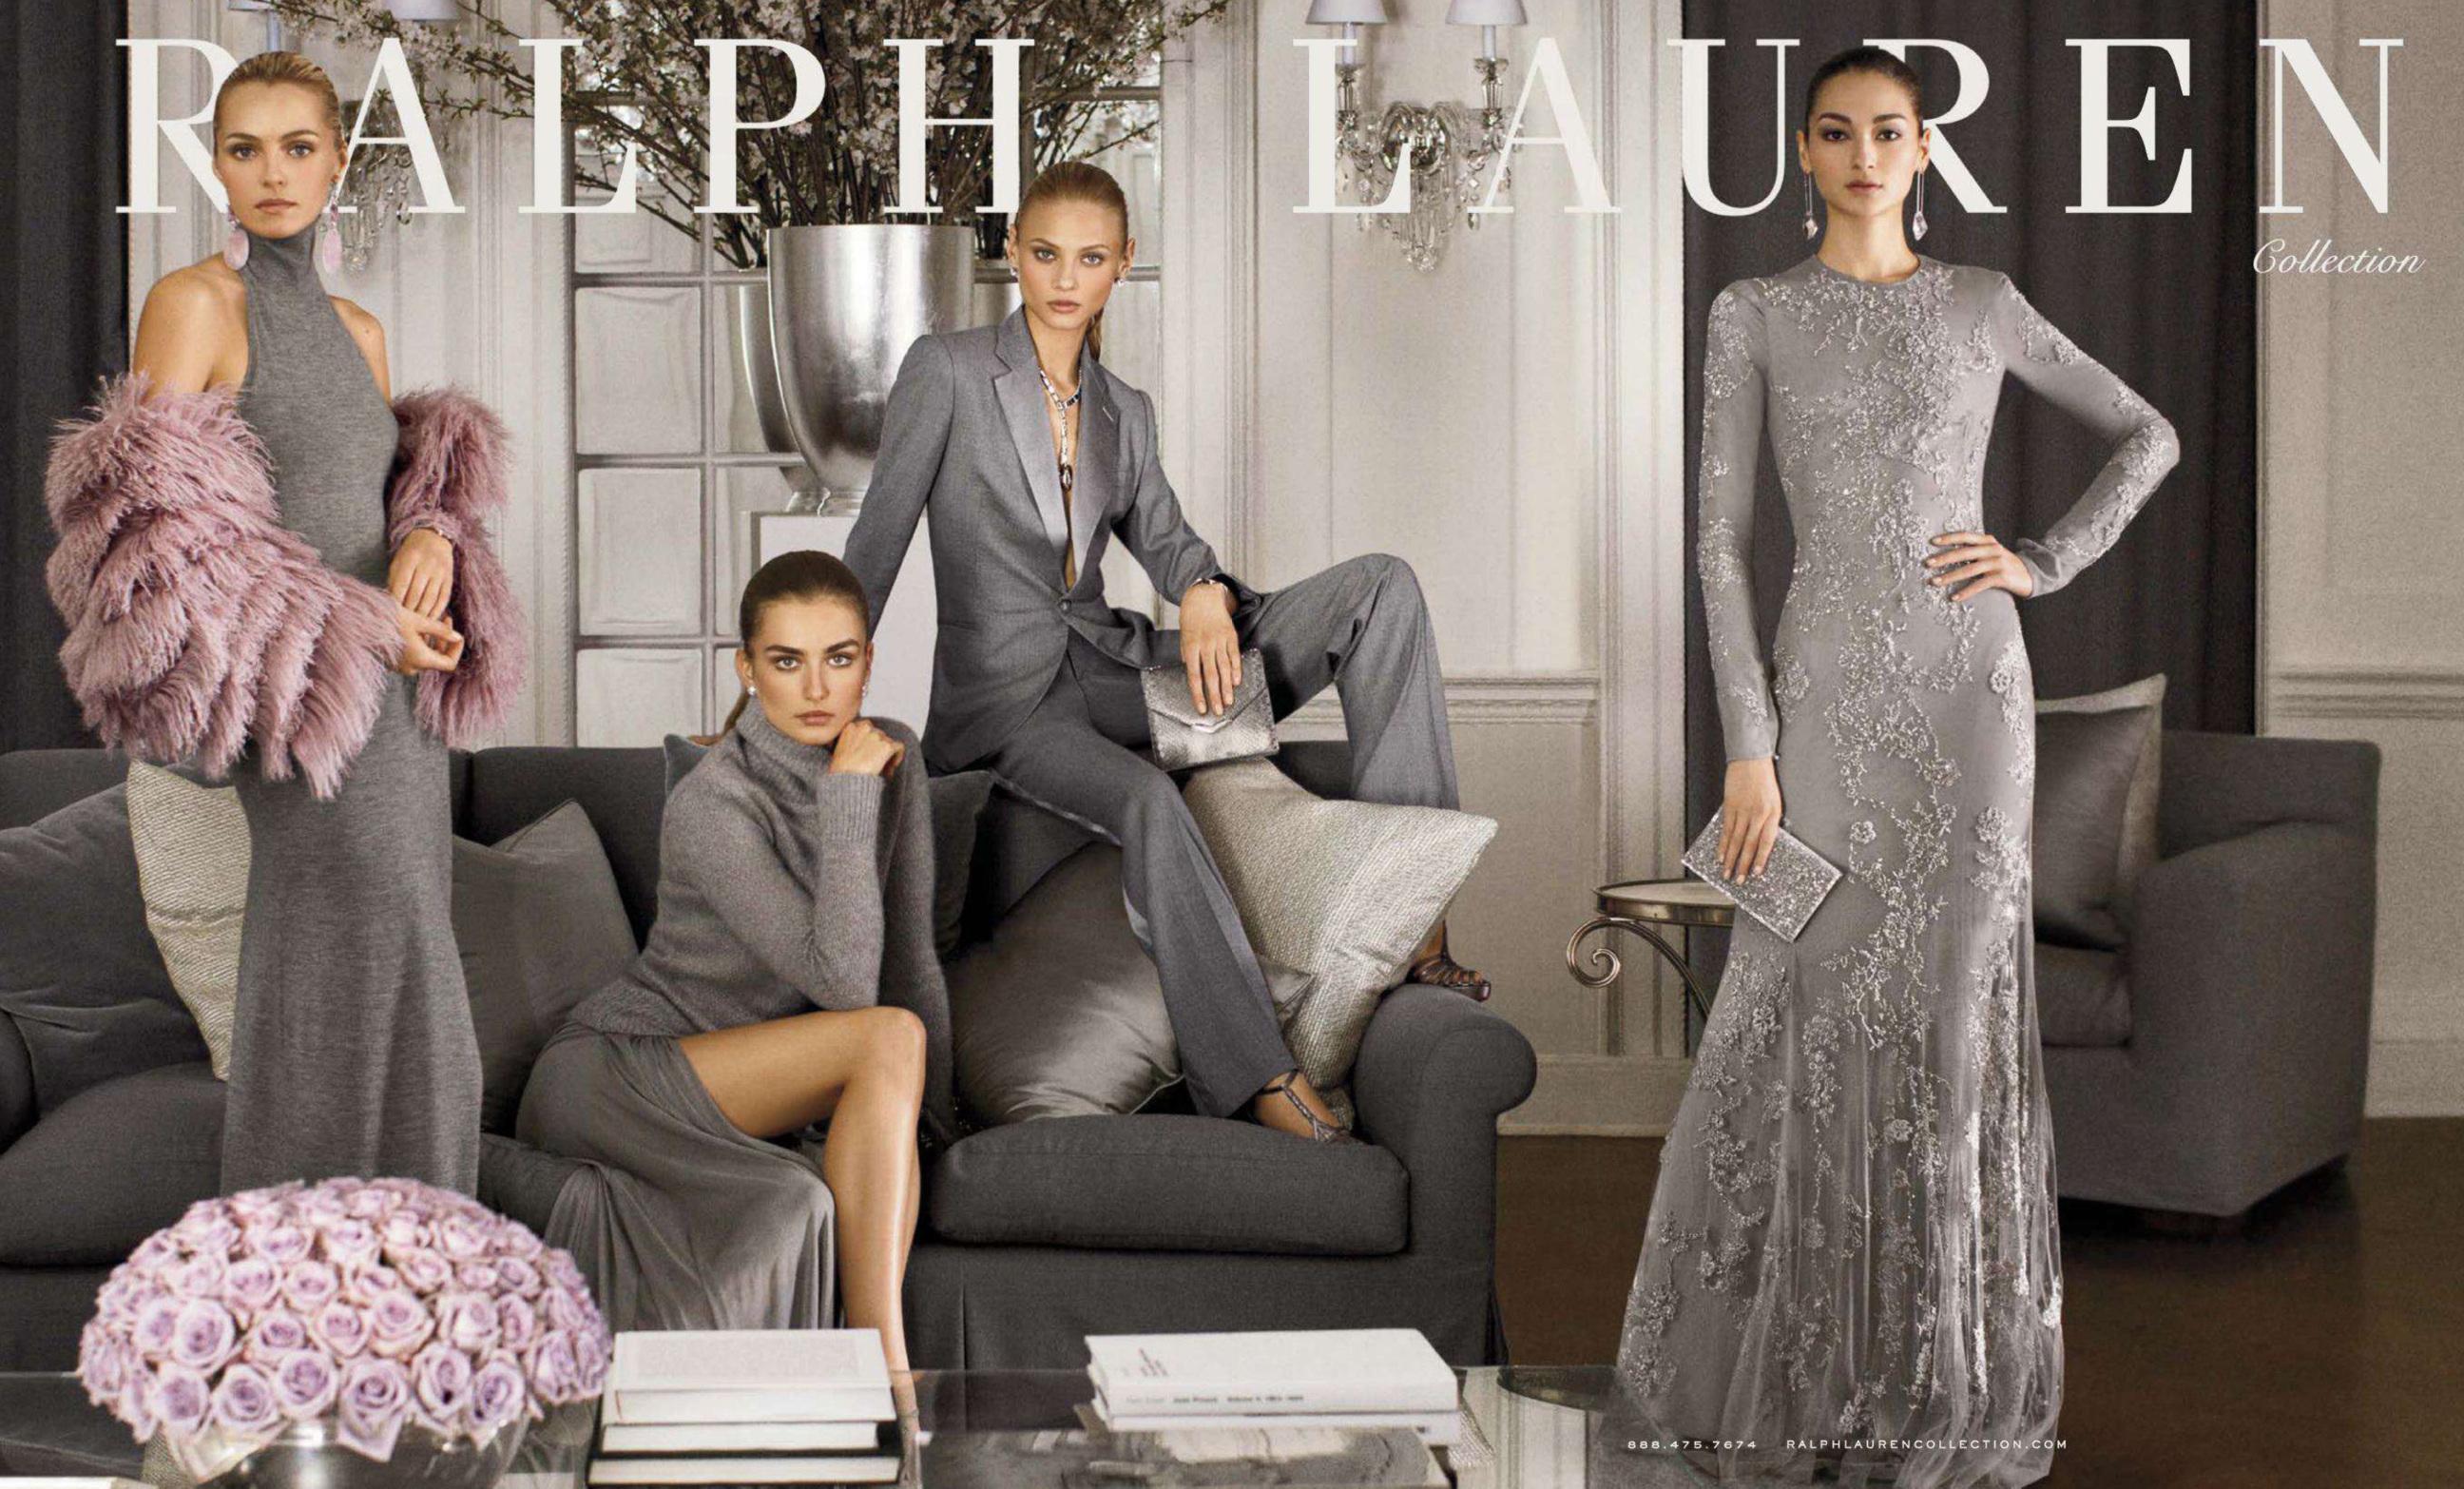 Ralph-Lauren-fall-2014-ad-campaign-Andreea Diaconu-Anna-Selezneva-Bruna-Tenorio-Valentina-Zelyaevathe-by-carter-berg-the-impression-1